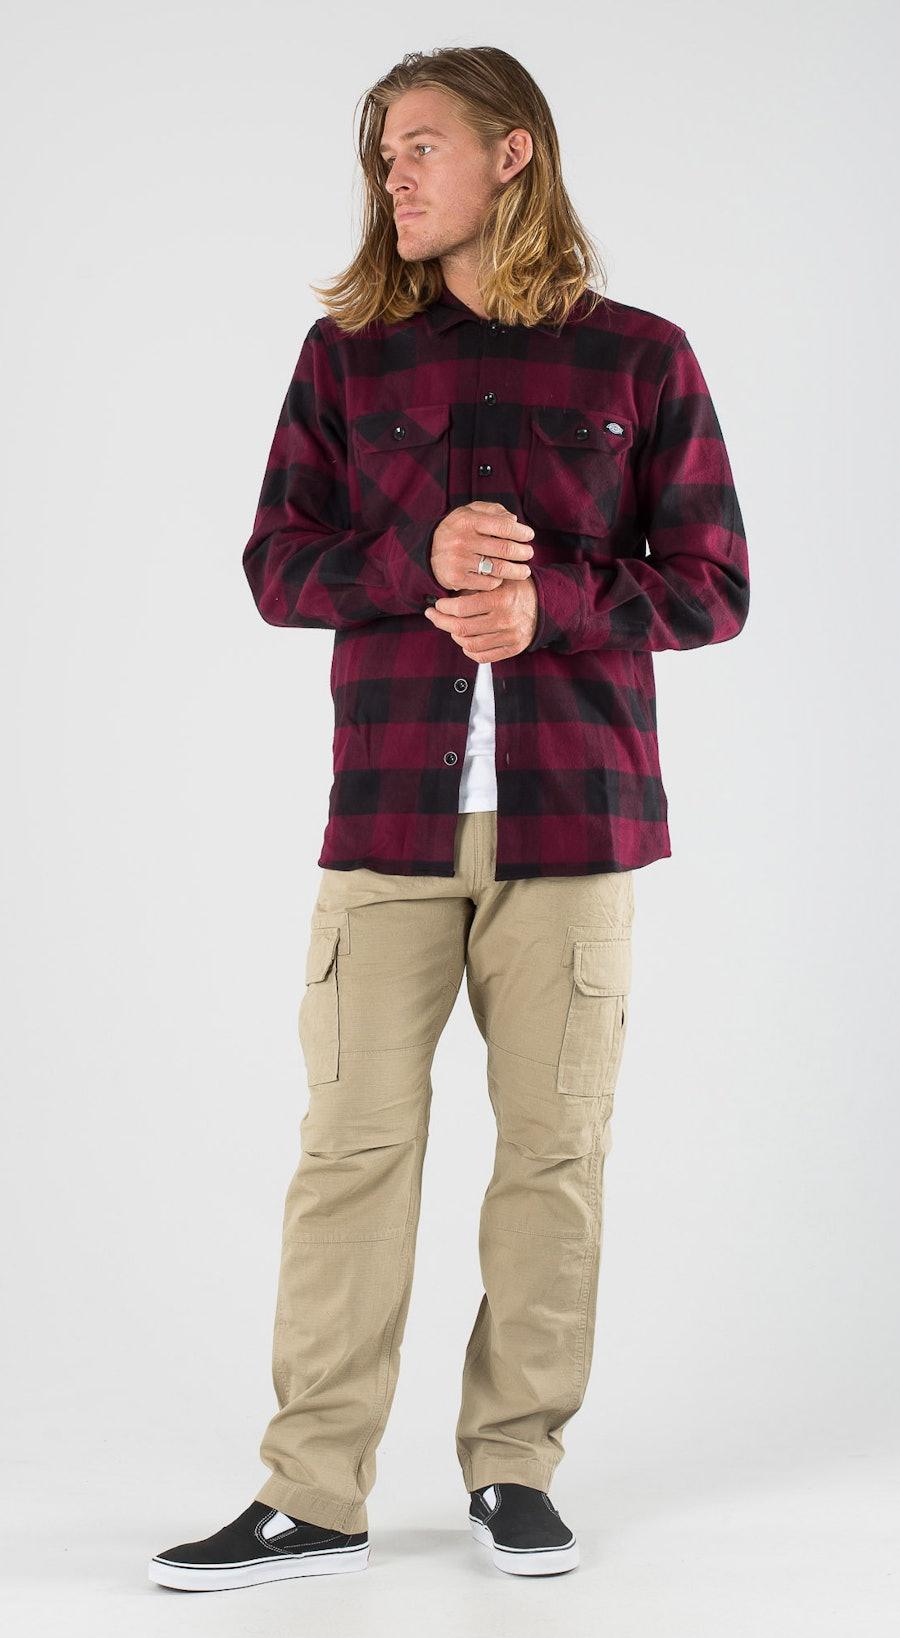 Dickies Sacramento Maroon Outfit Multi